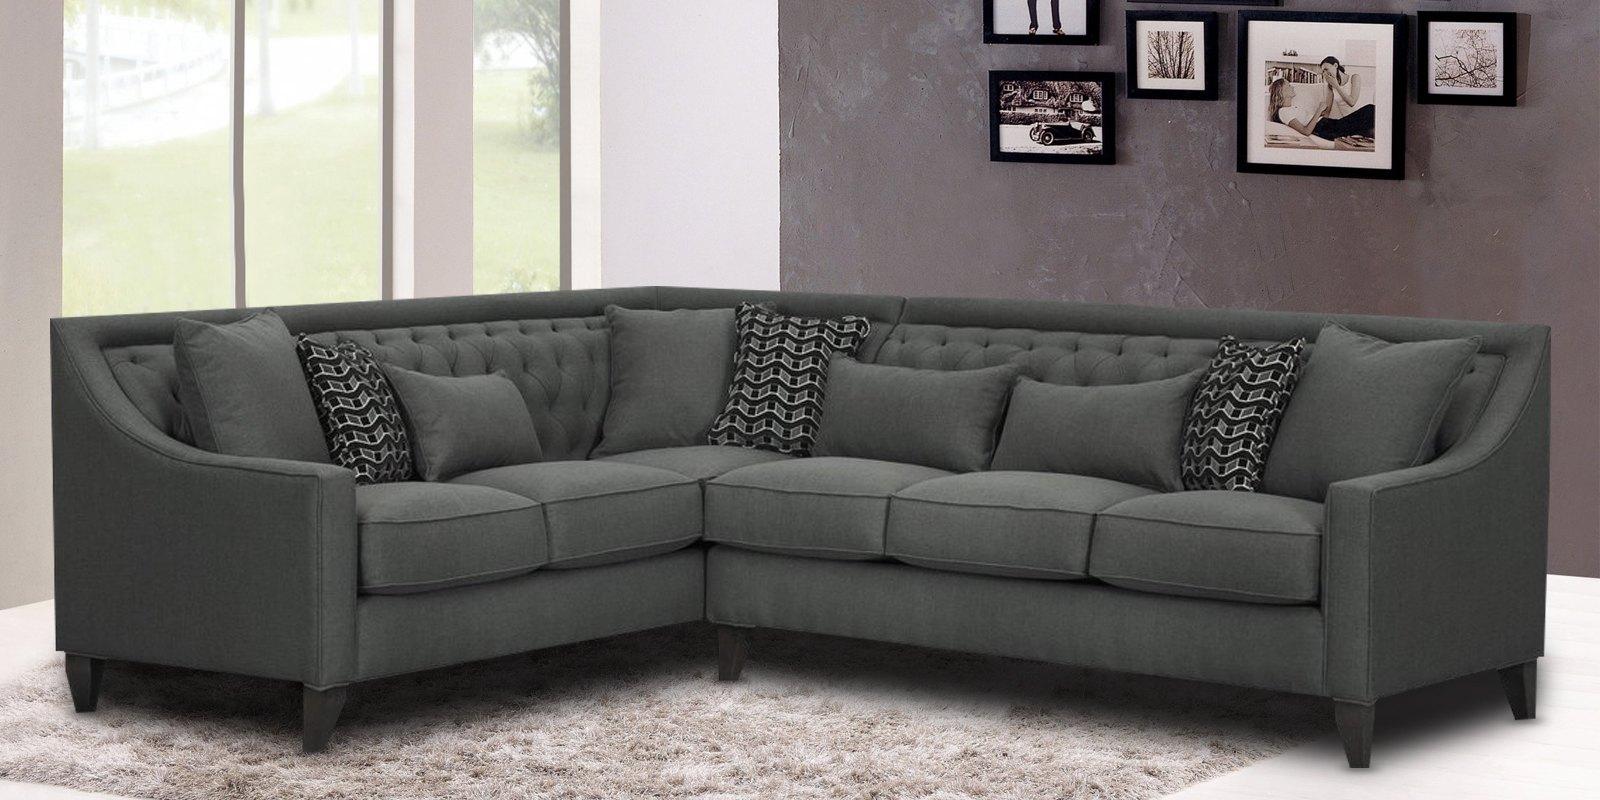 Nirvana LHS Sofa In Grey Colour